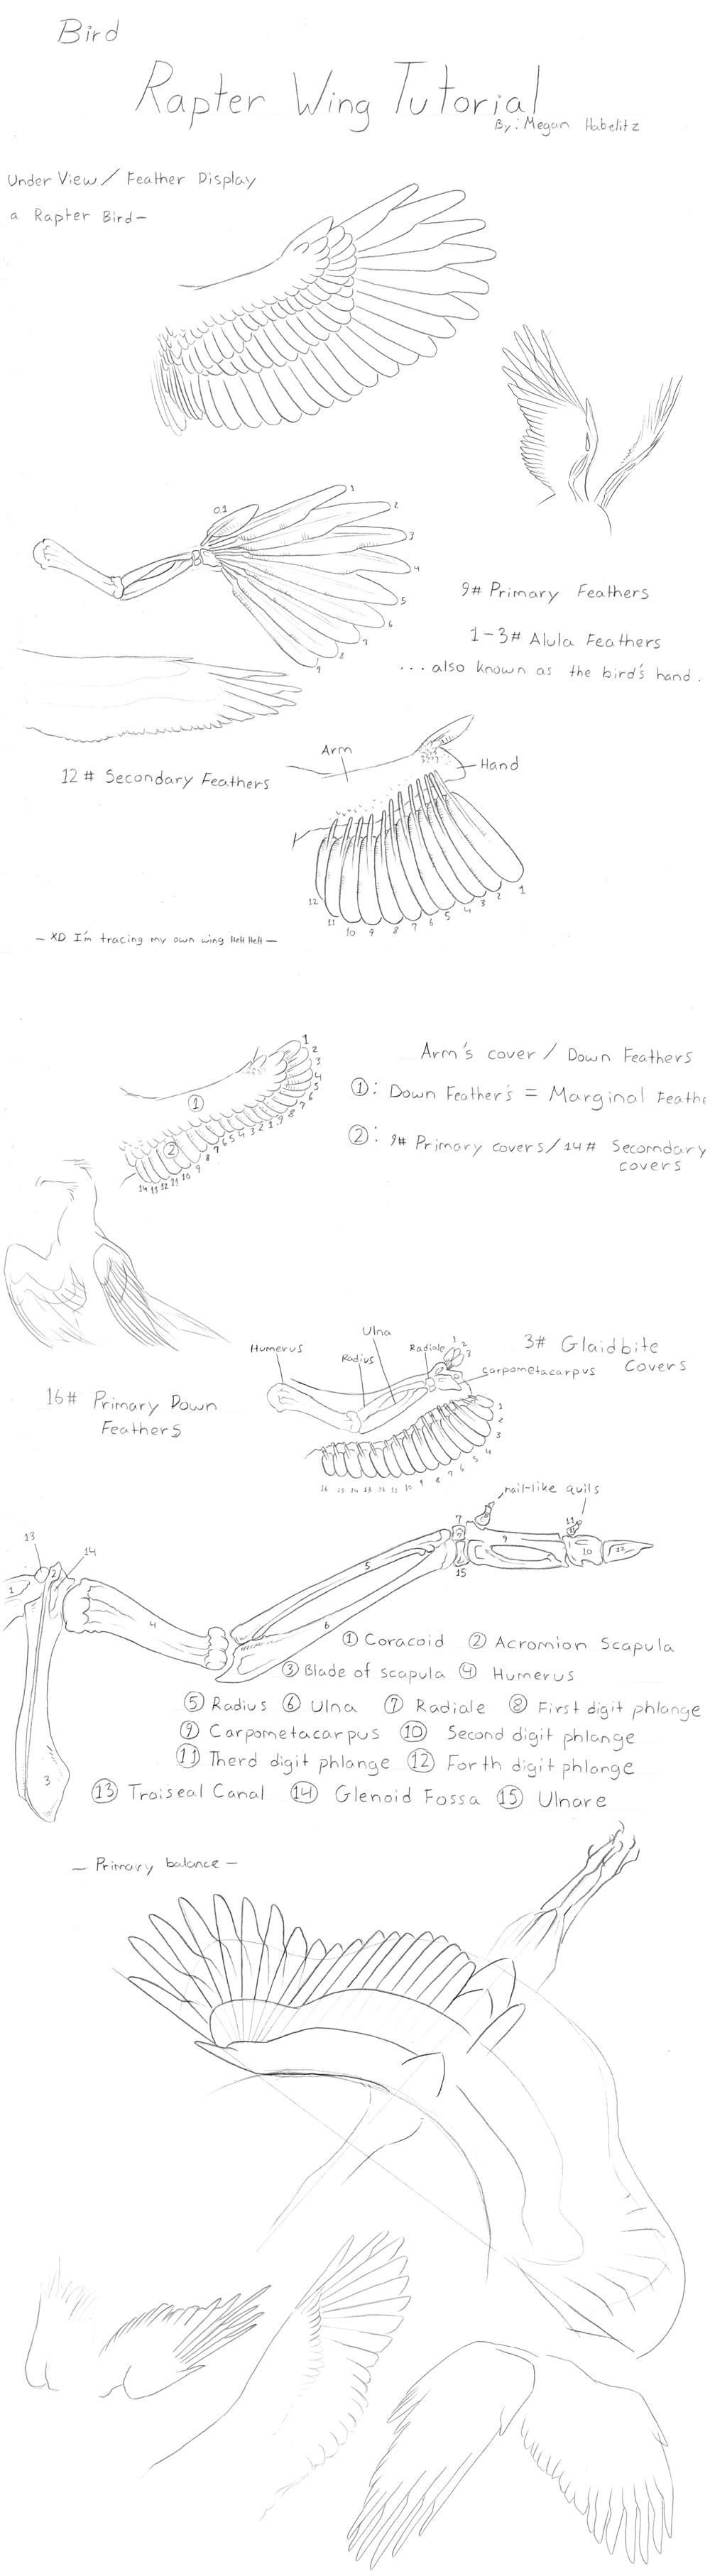 Raptor Bird Wing Tutorial by KutkuMegsan | Draw Angel and Bird Wings ...